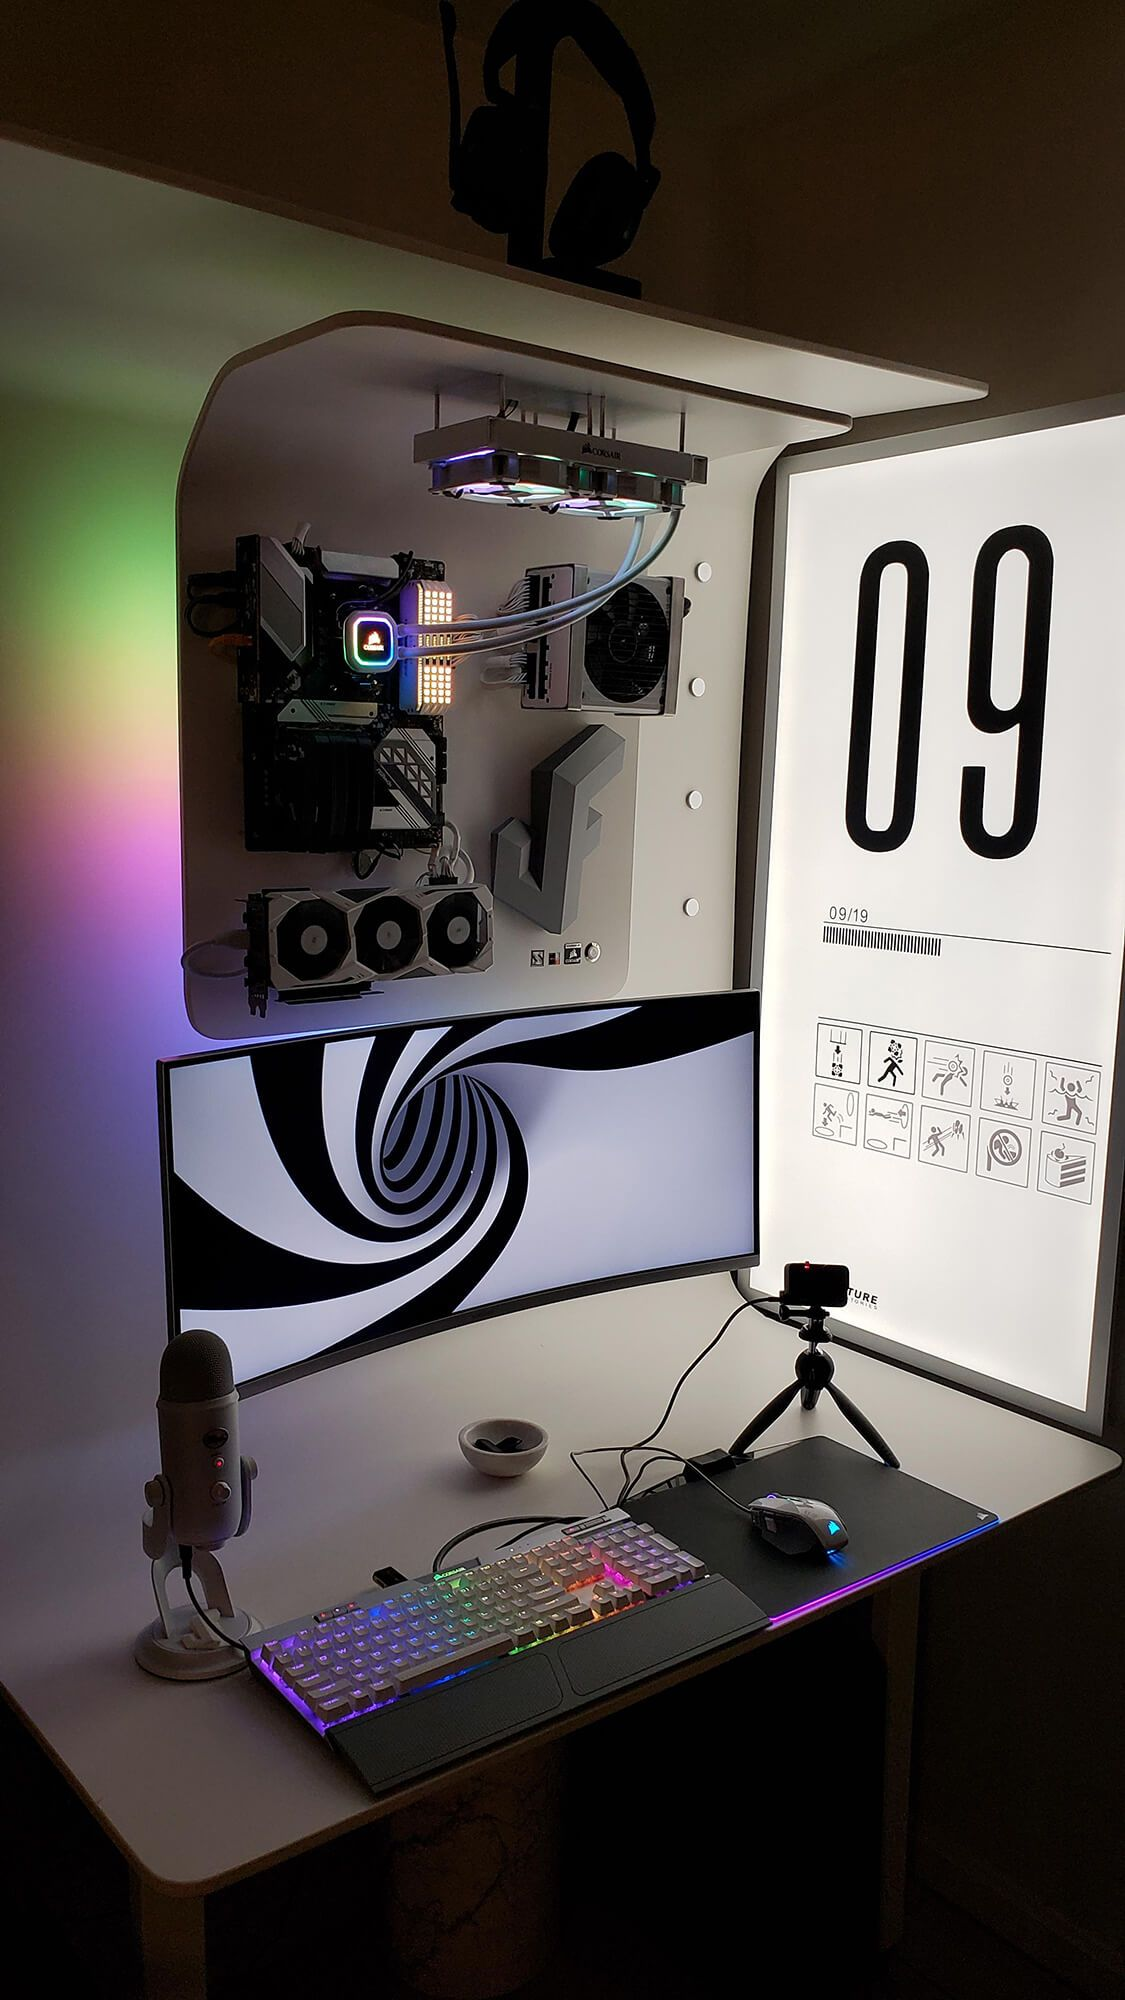 Futuristic DIY battlestation